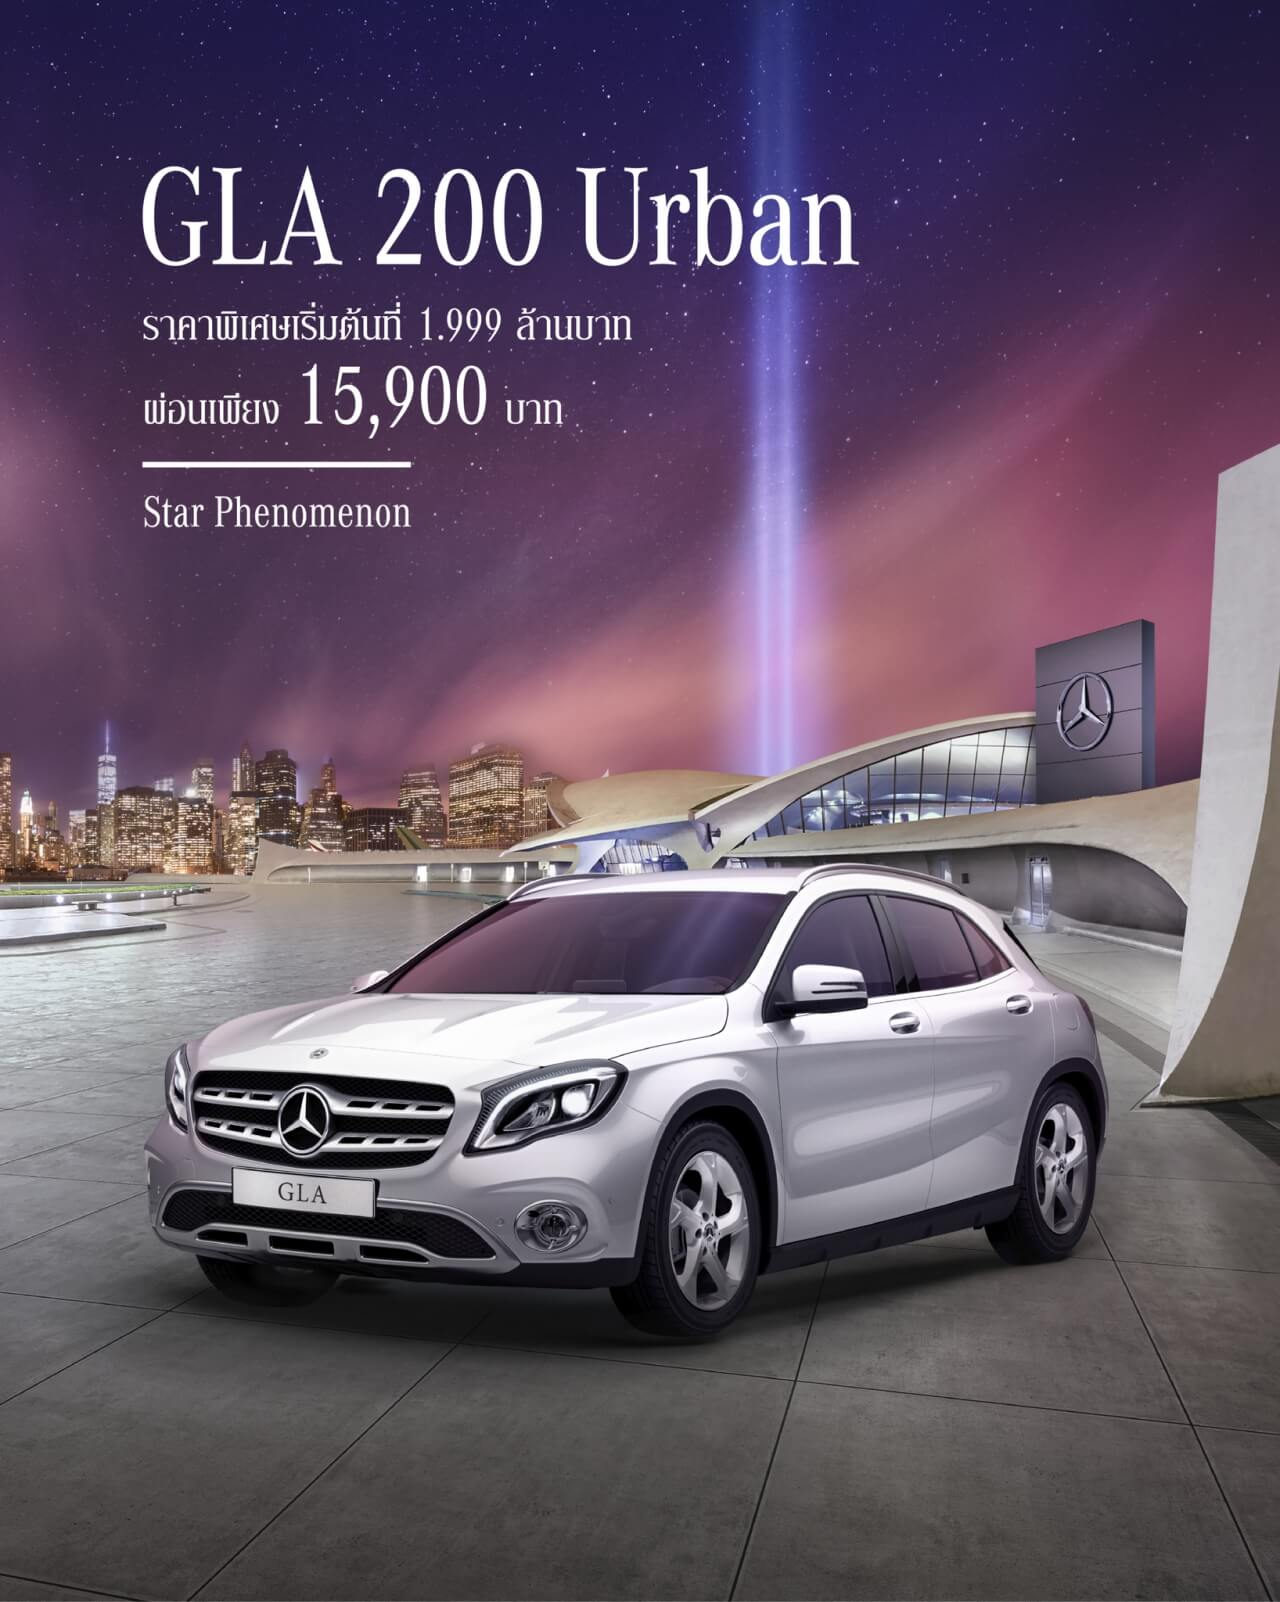 Photo of เมอร์เซเดส-เบนซ์ จัดแคมเปญ GLA 200 Urban ราคาพิเศษ